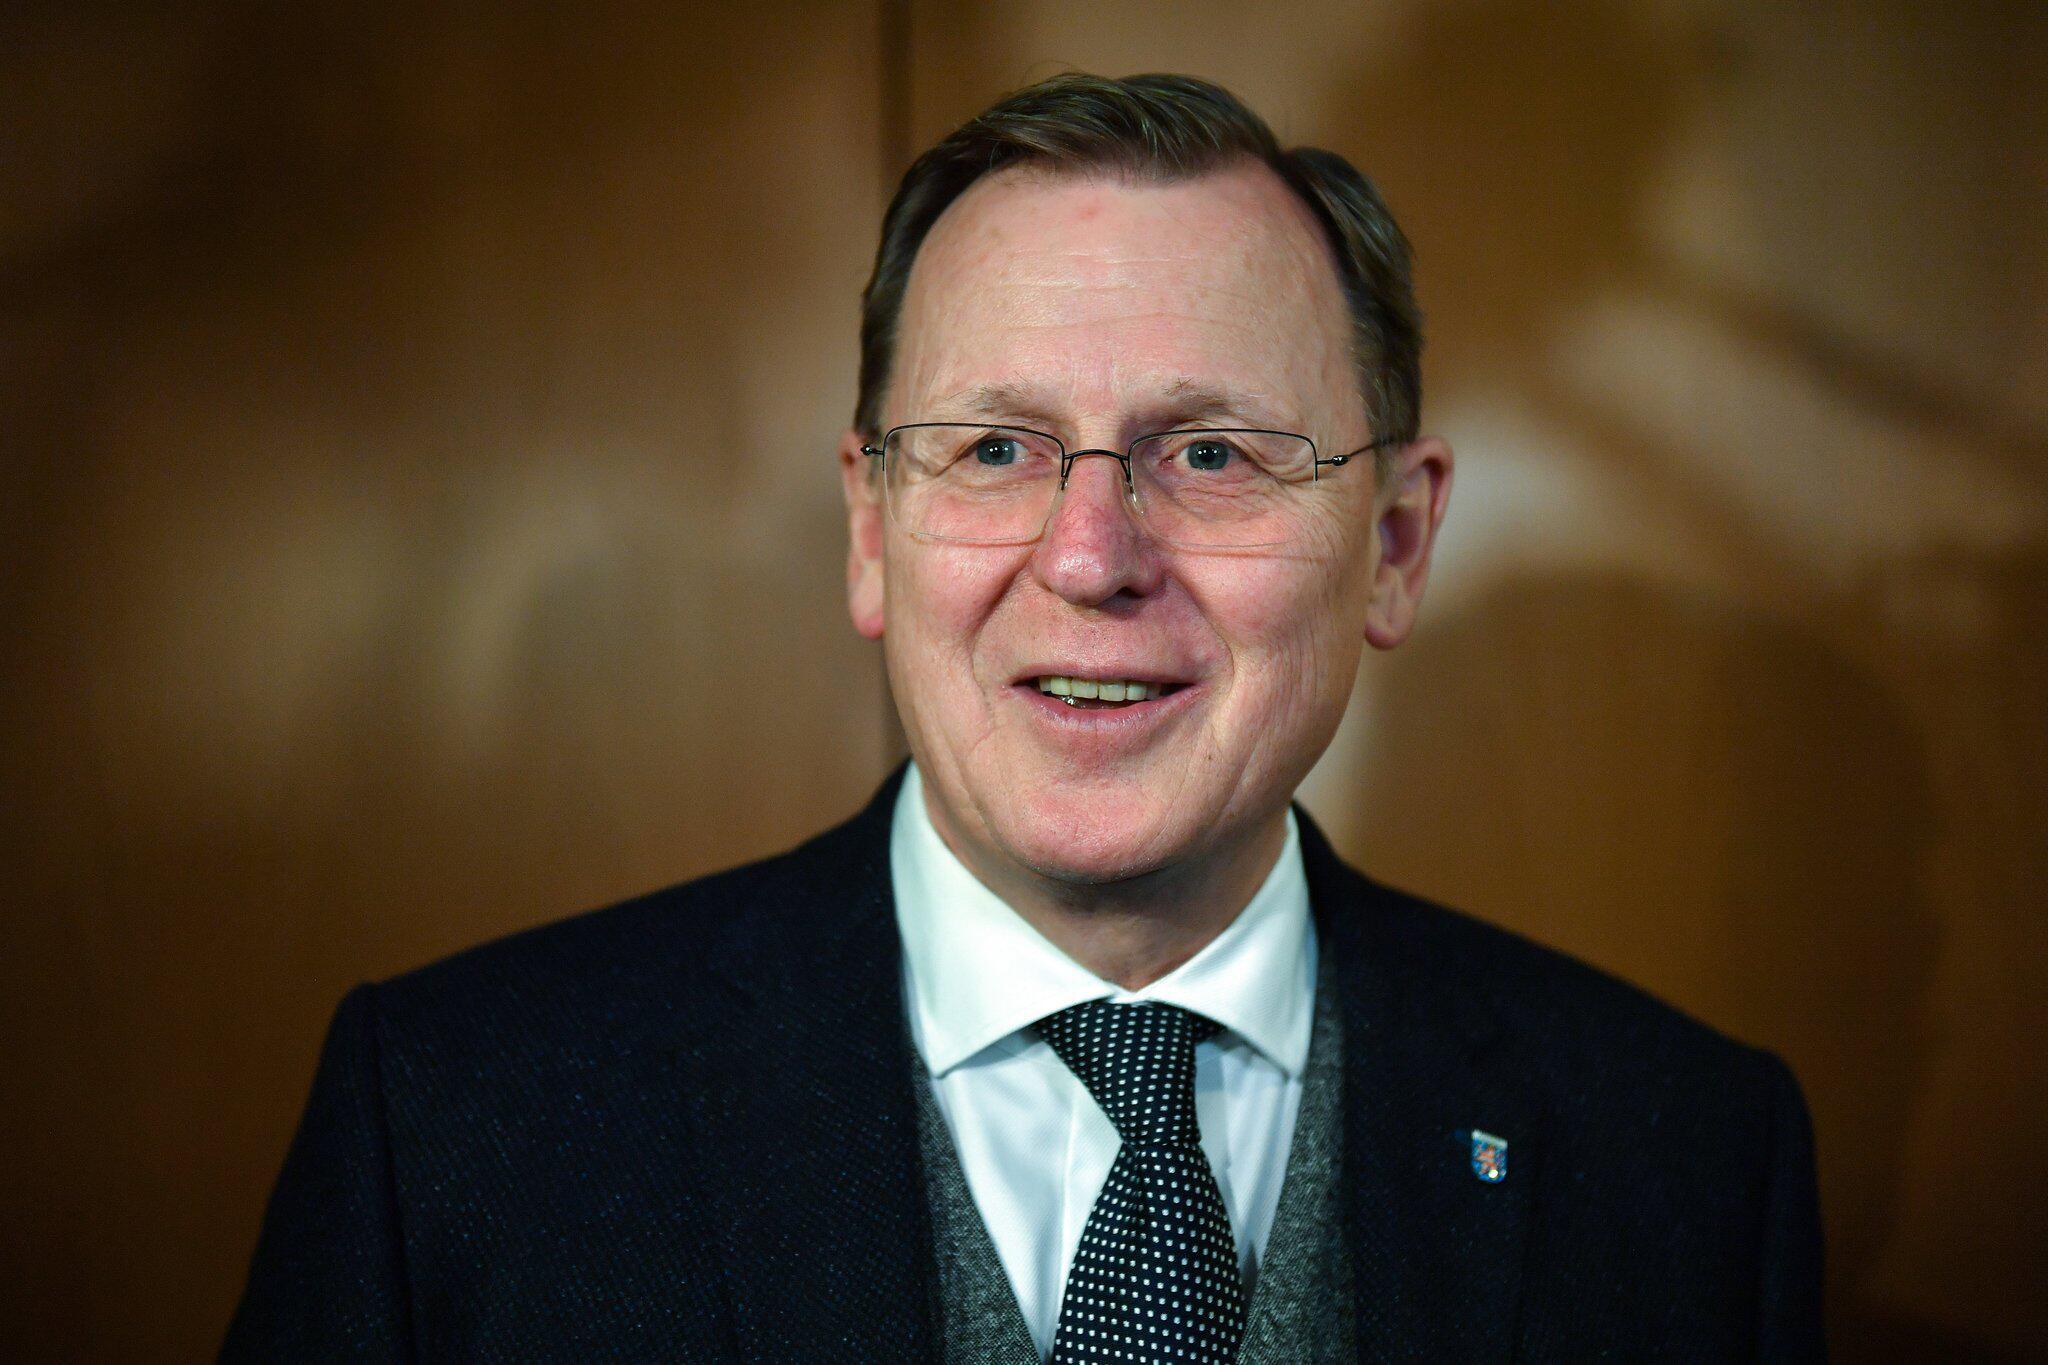 Bild zu Thüringens Ex-Ministerpräsident Ramelow